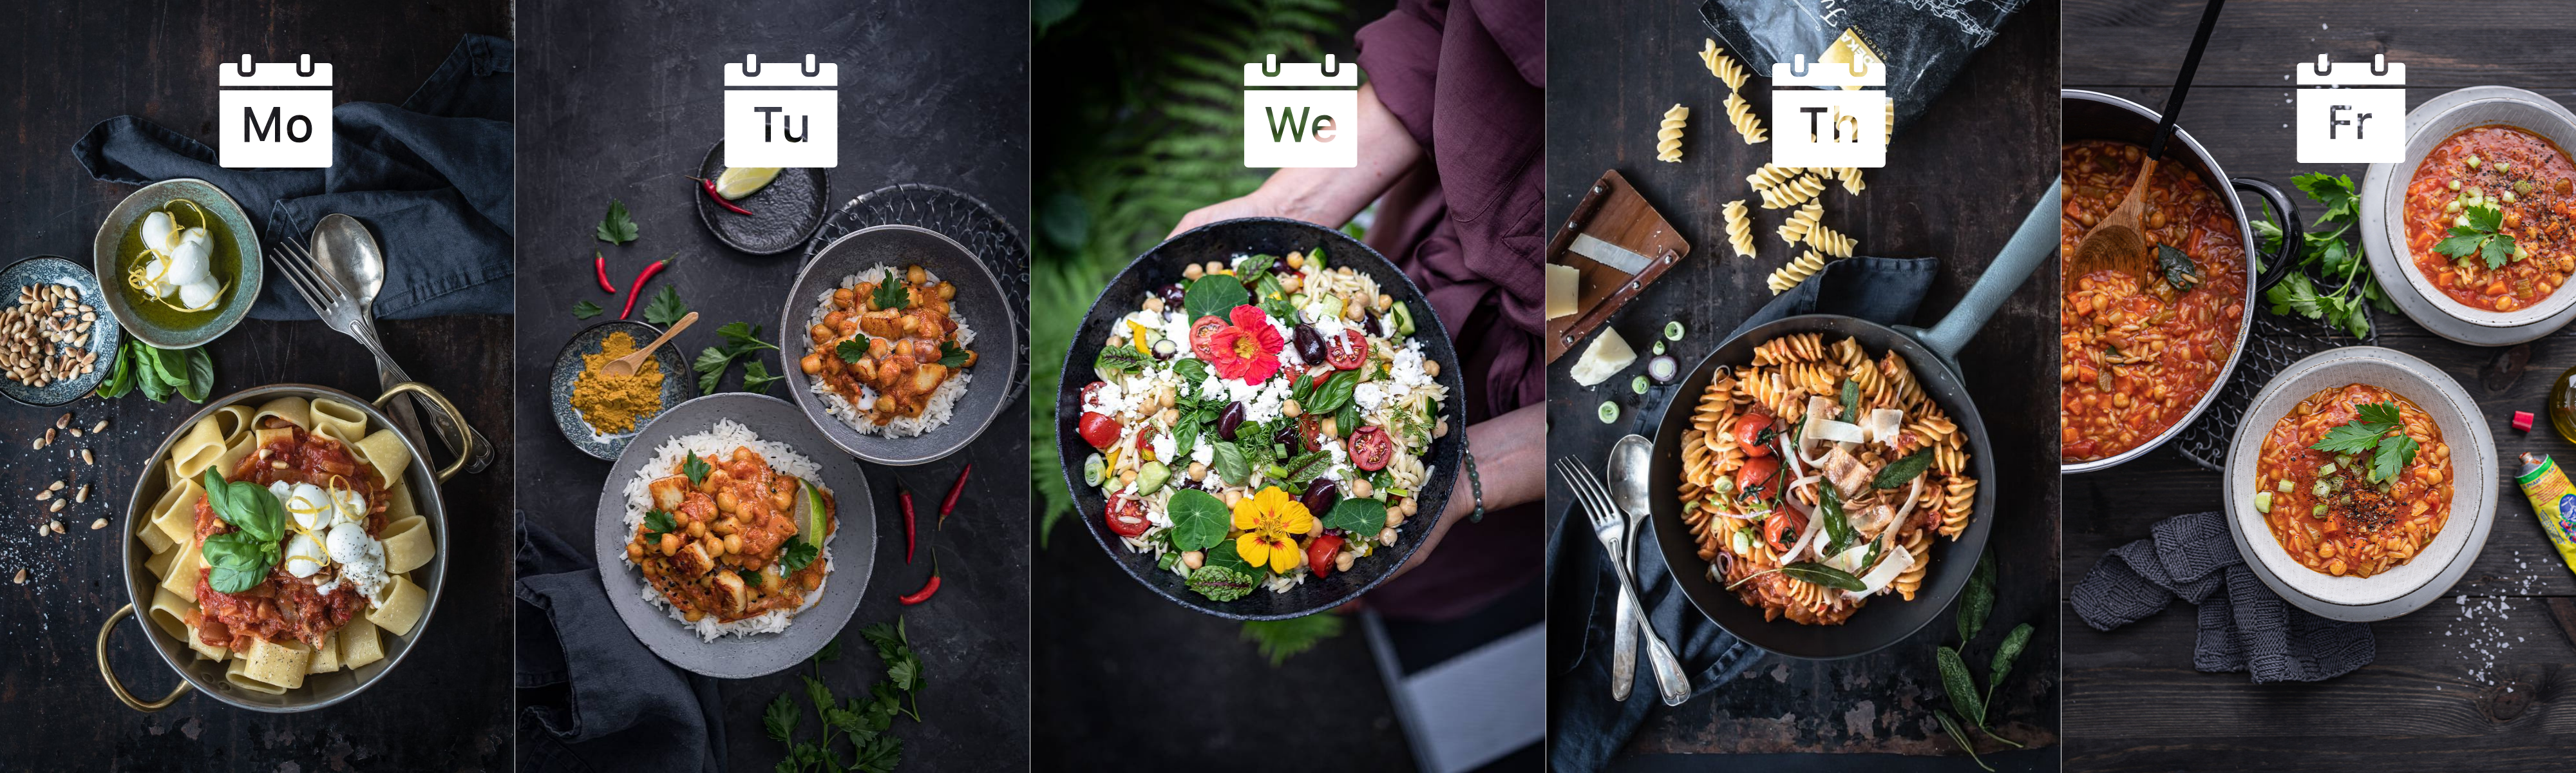 5 Wochenplan Rezepte Foodblog trickytine